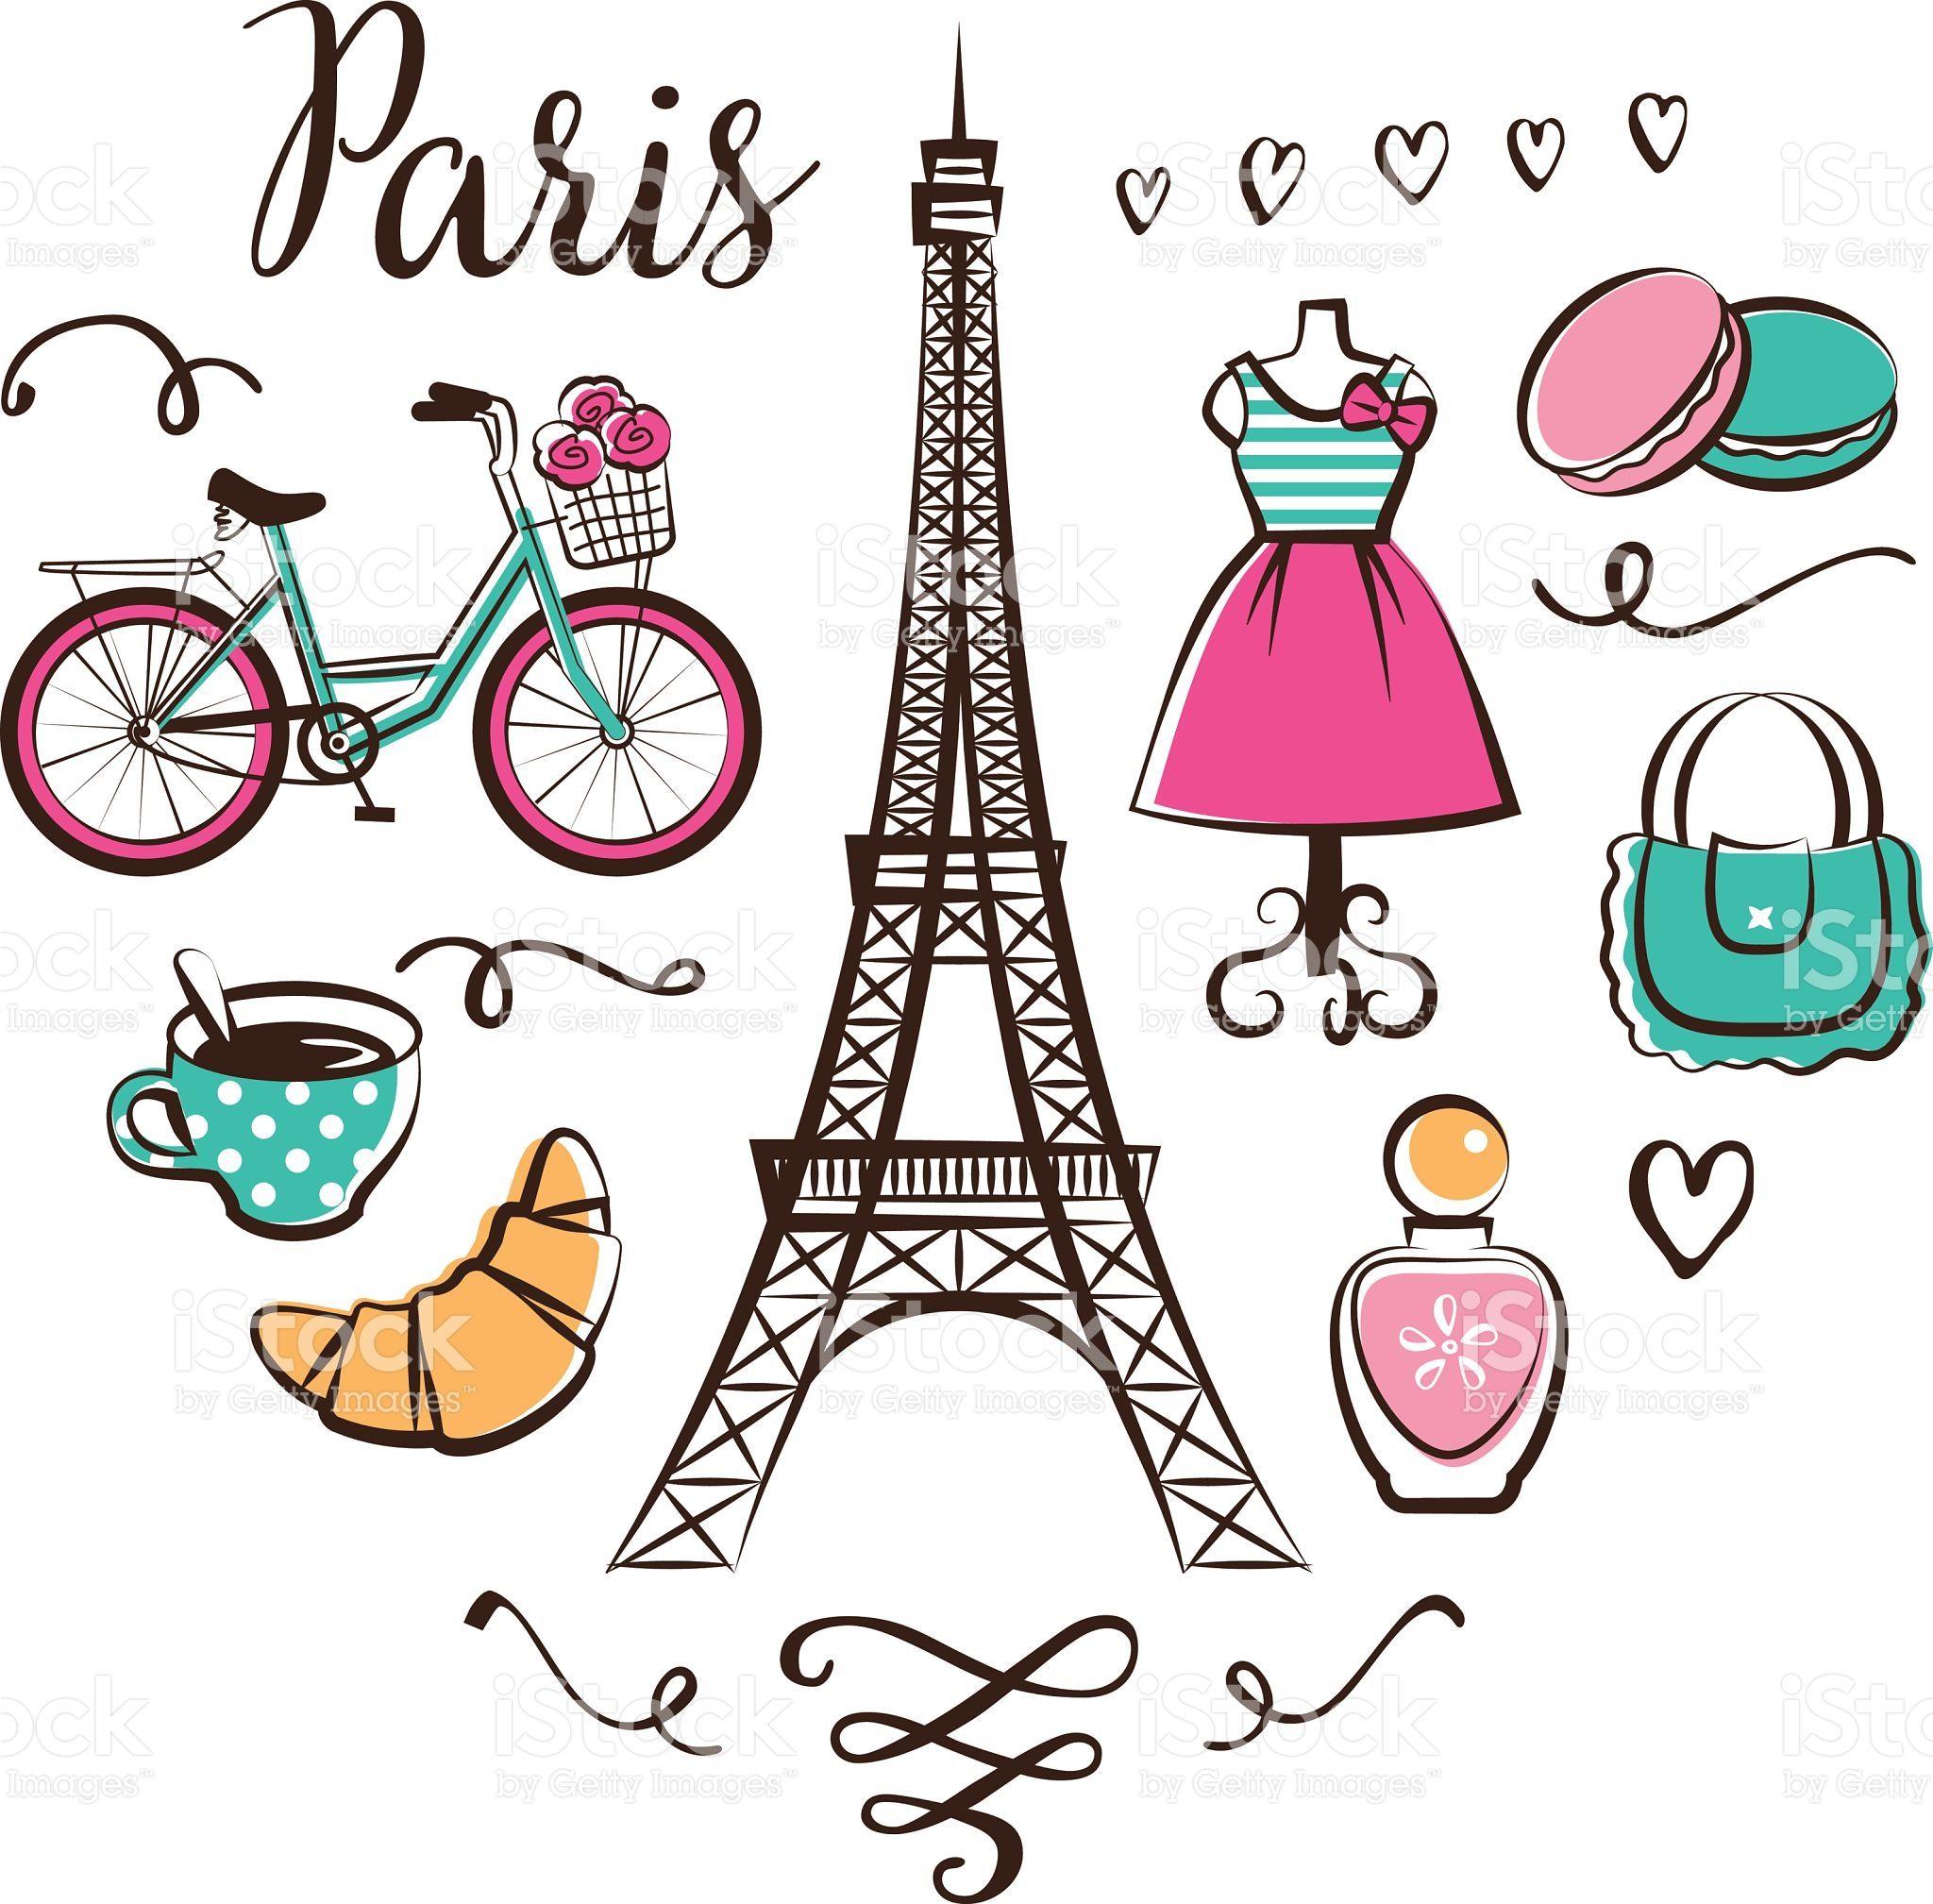 Parisian clipart free graphic download Love for Paris. | PRINTABLES | Paris clipart, Paris ... graphic download